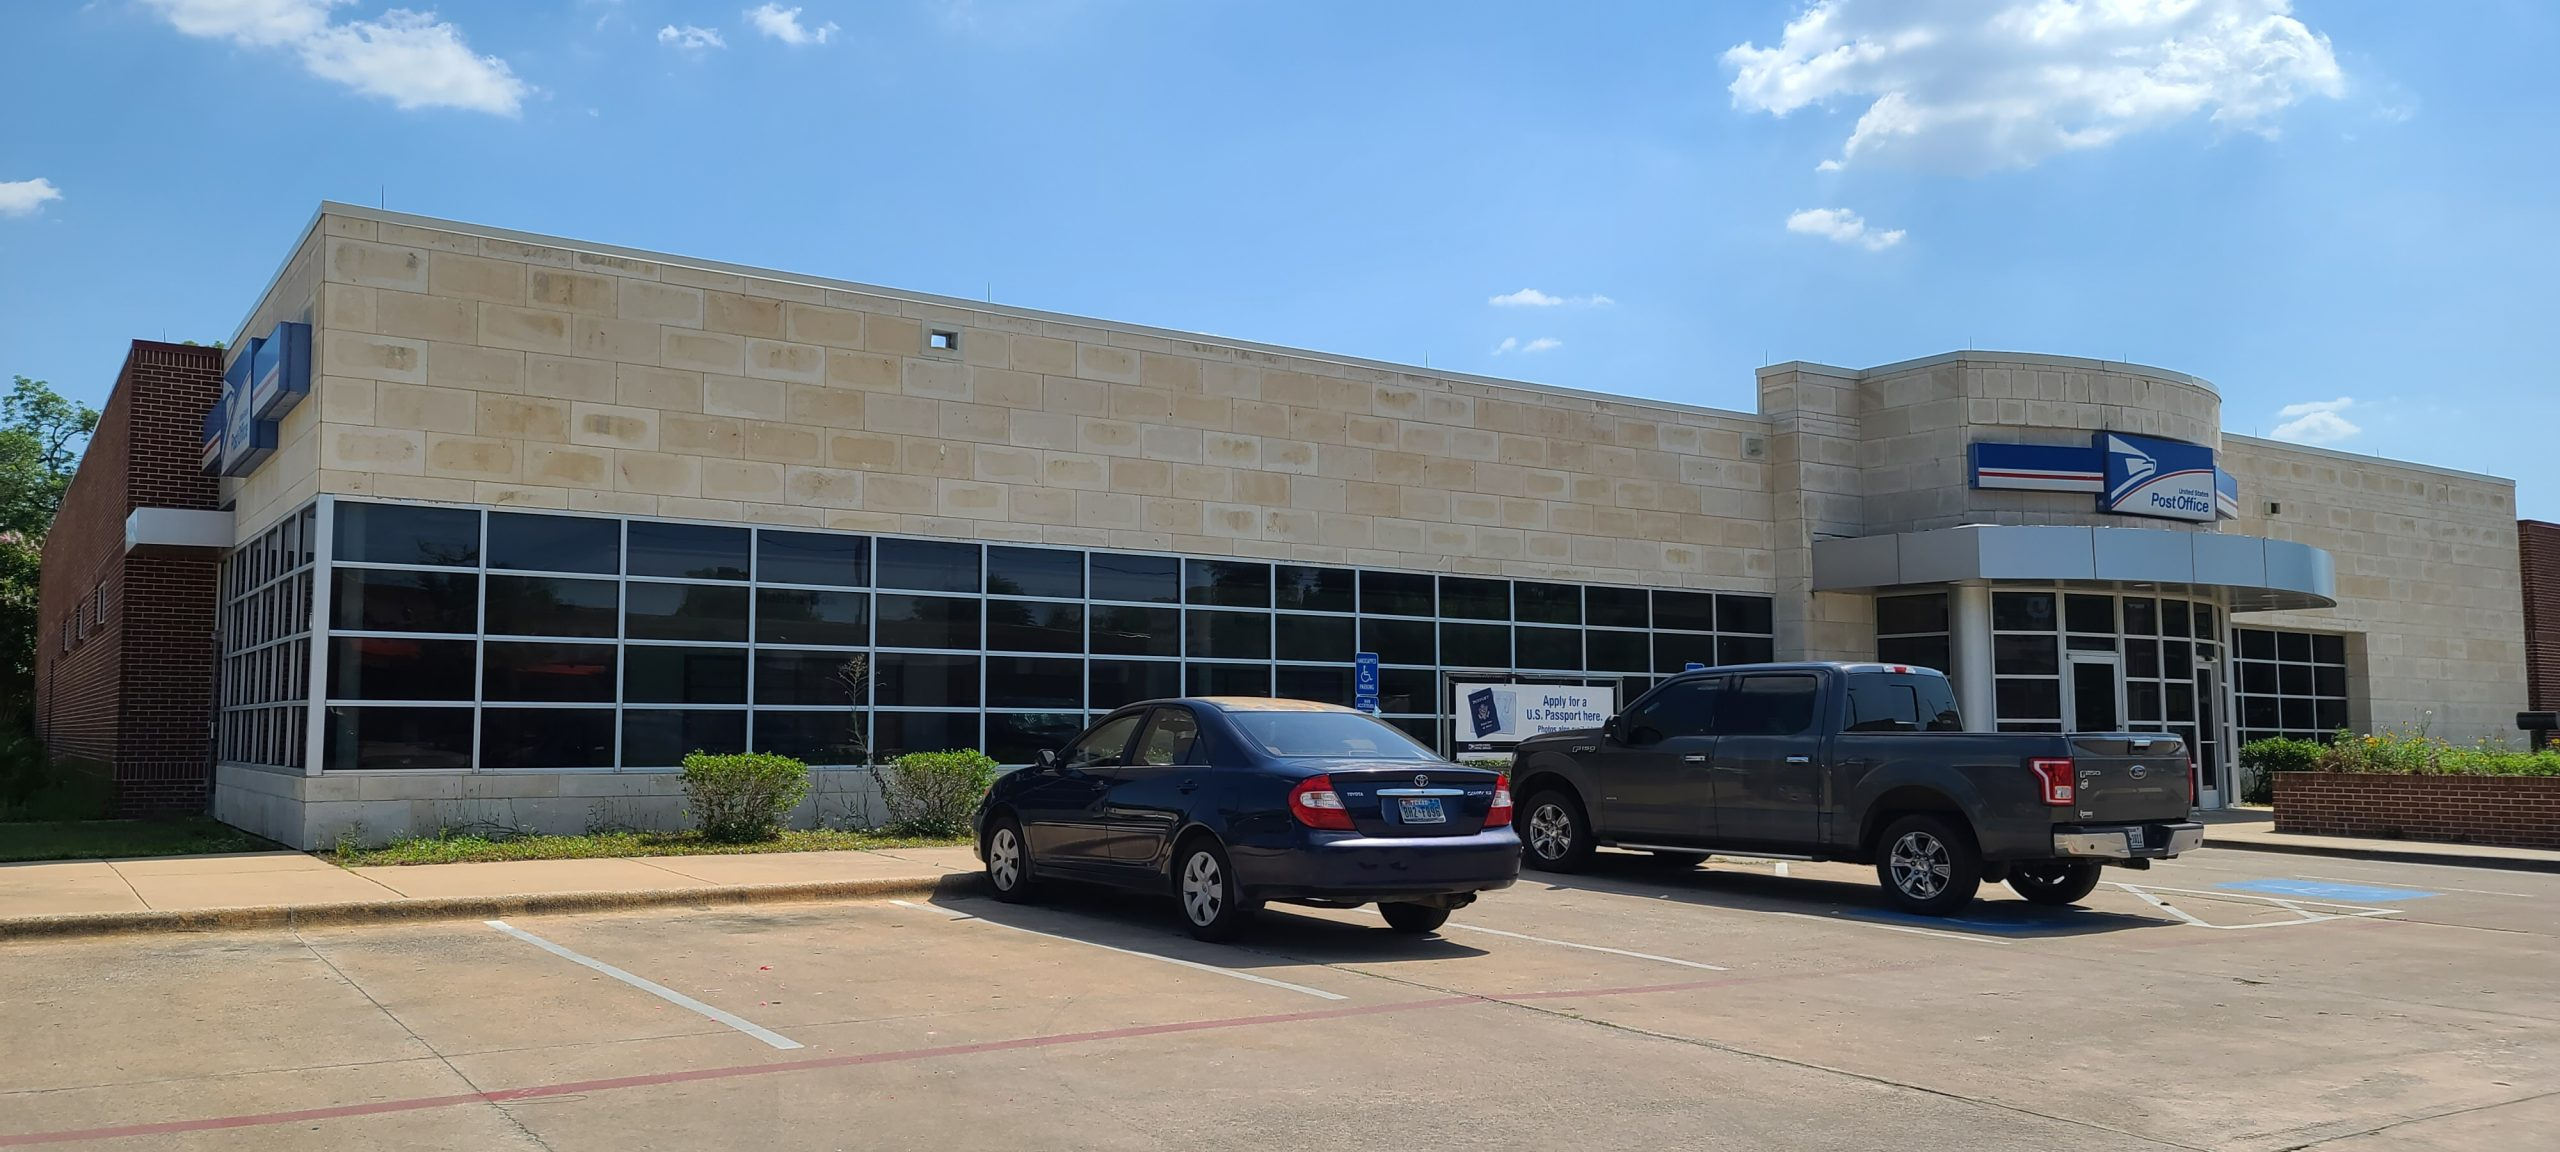 Paris, Texas Post Office